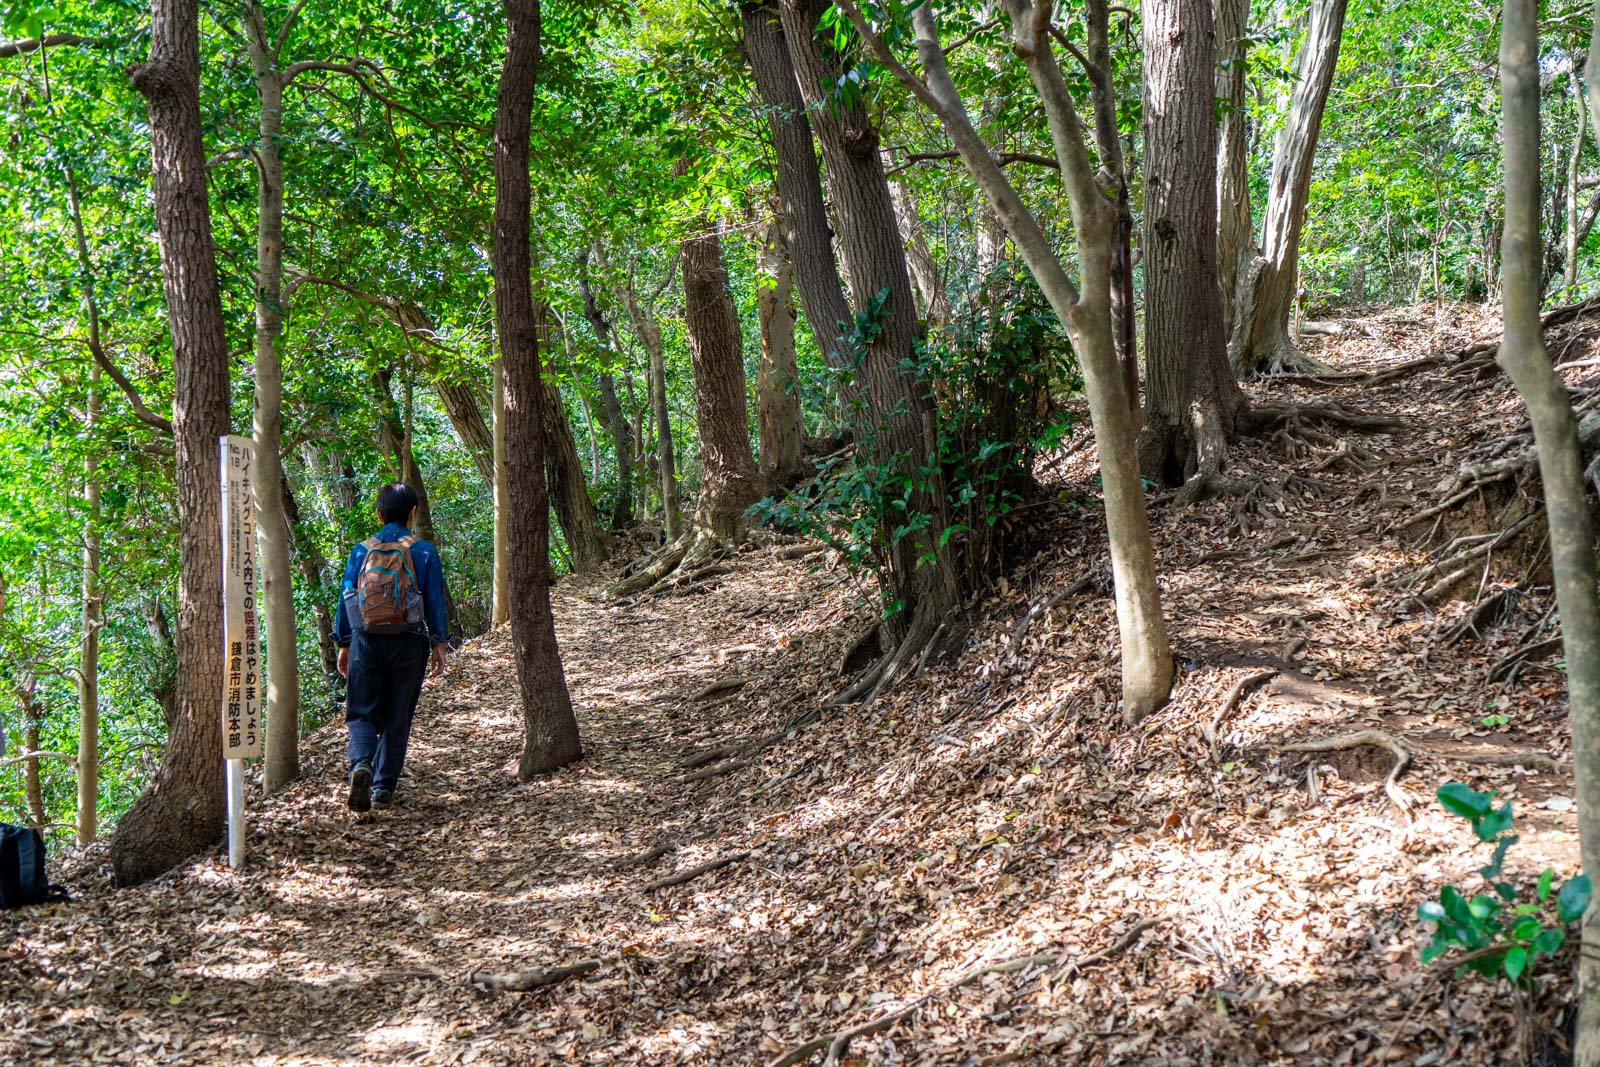 Daibutsu Hiking Trail, Kamakura, Japan